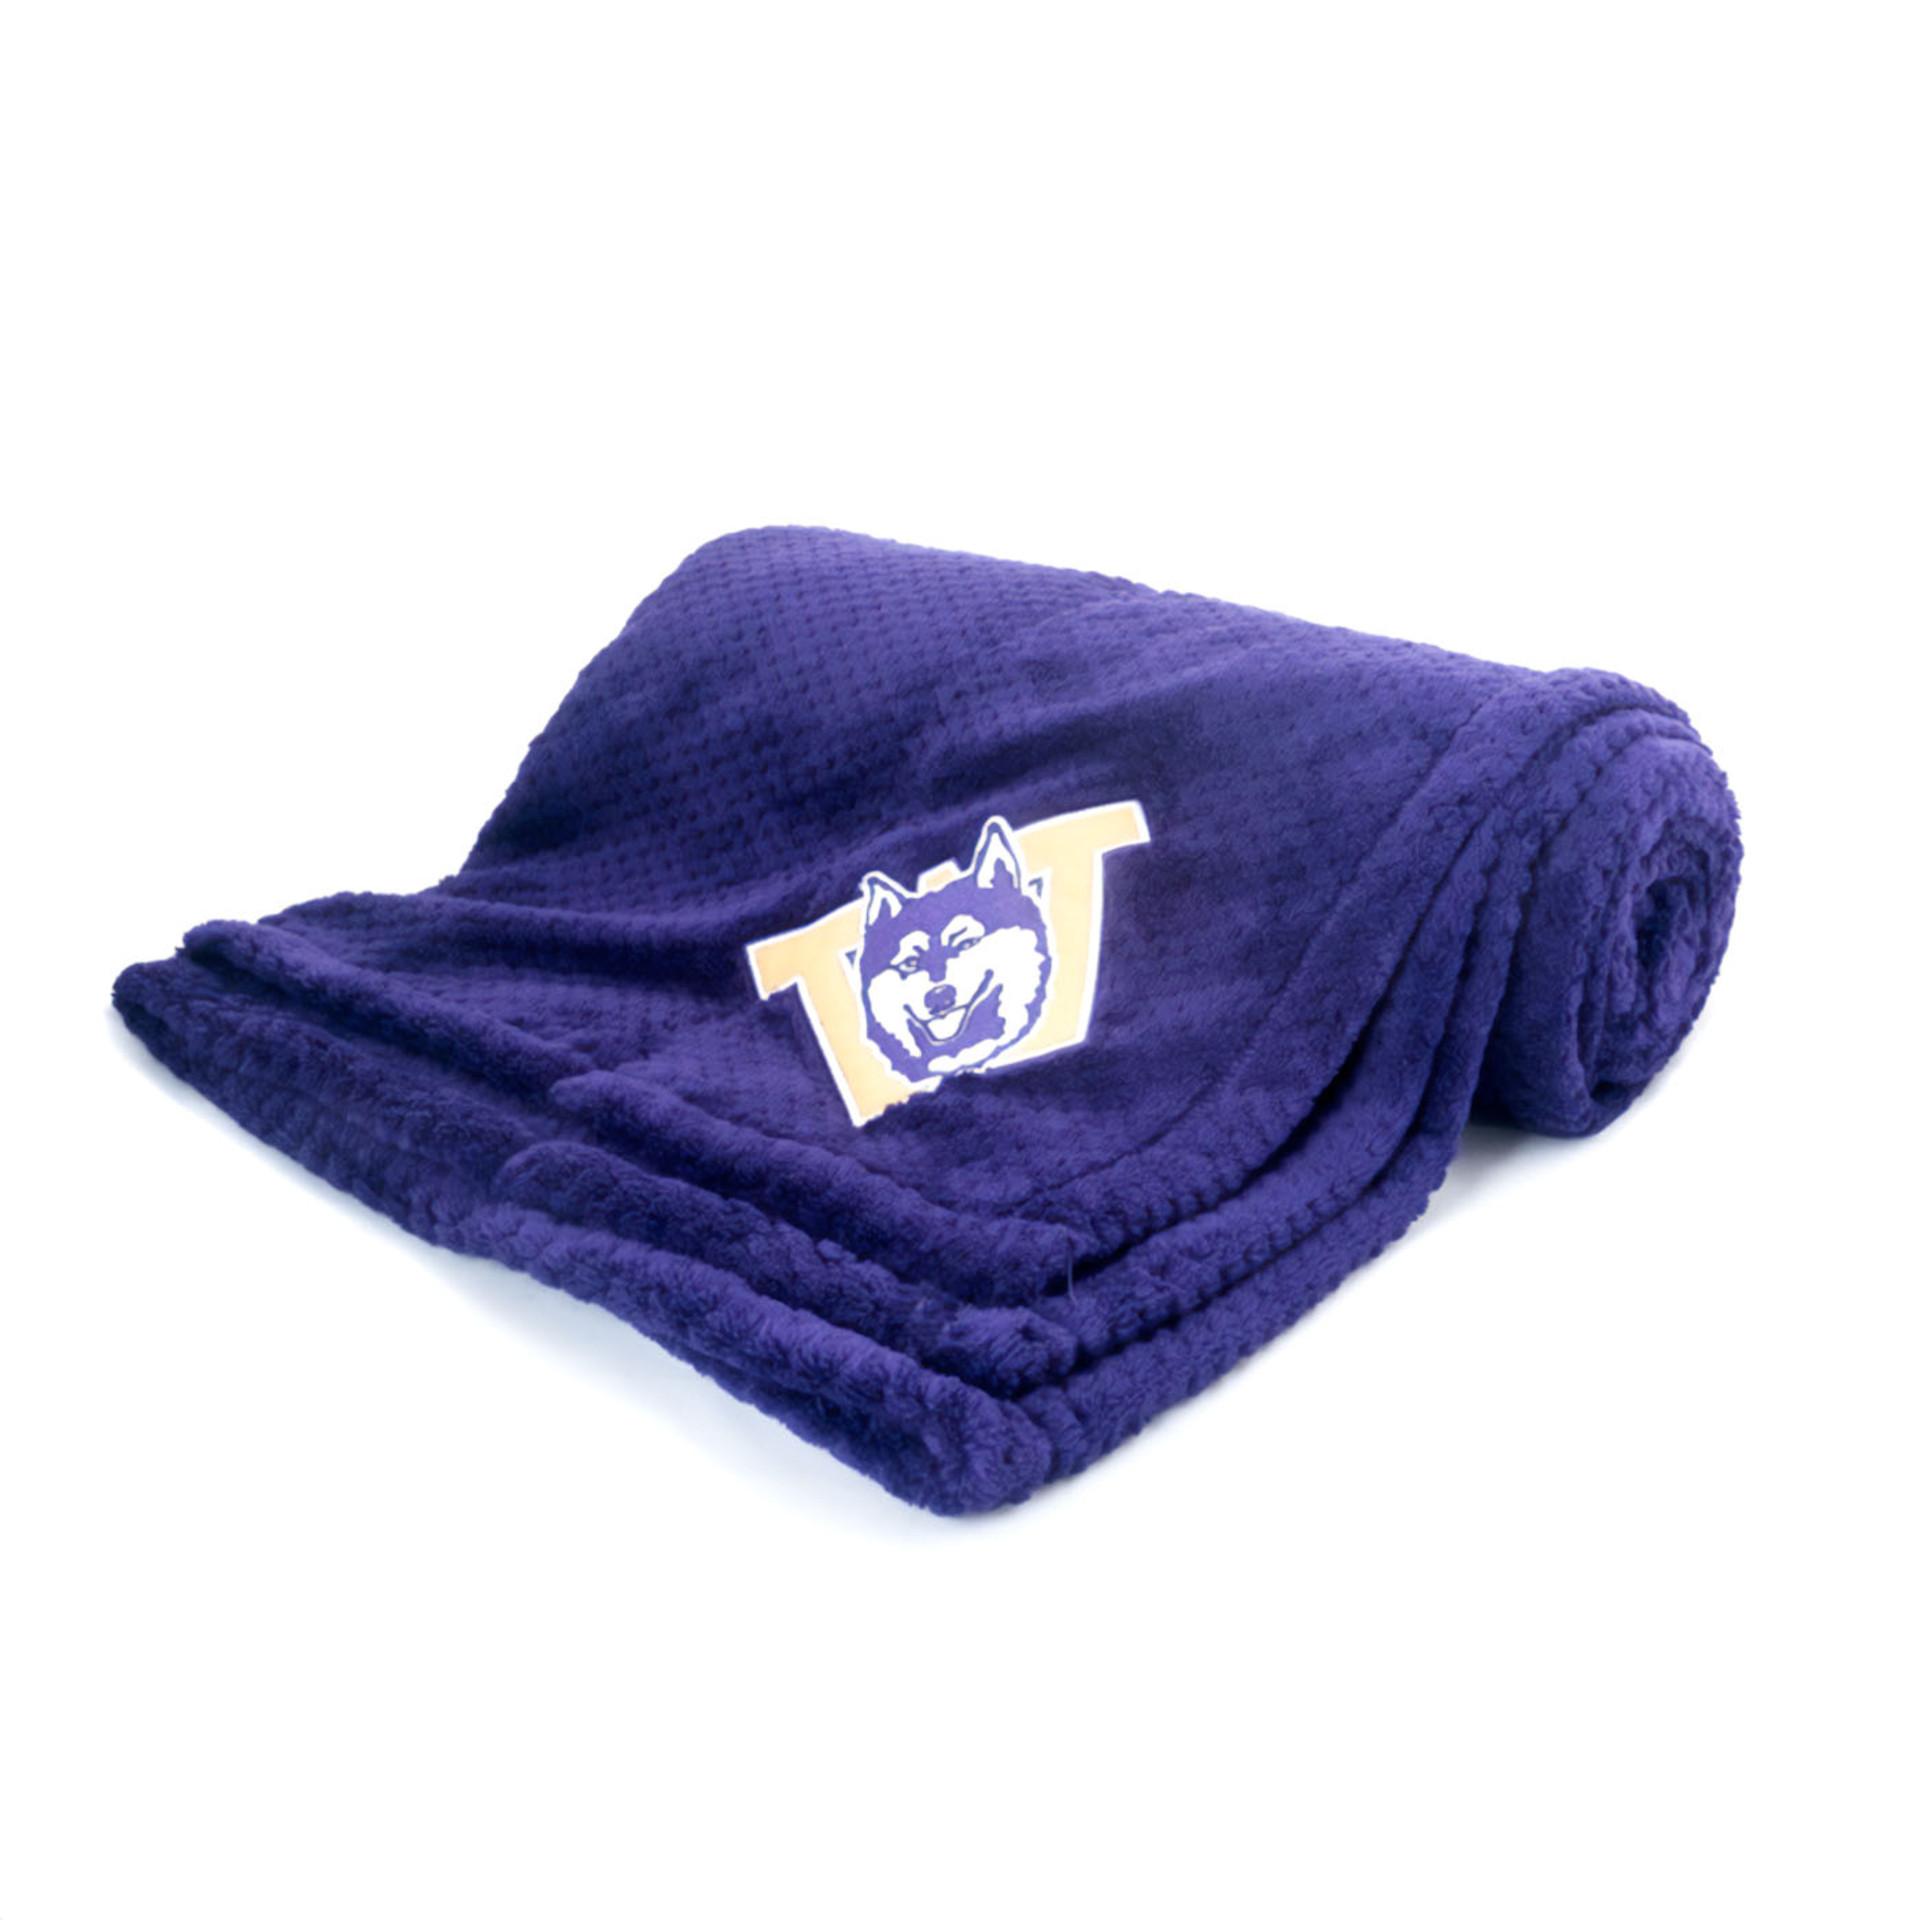 Know Wear Purple Vault Dog Pineapple Fleece Blanket